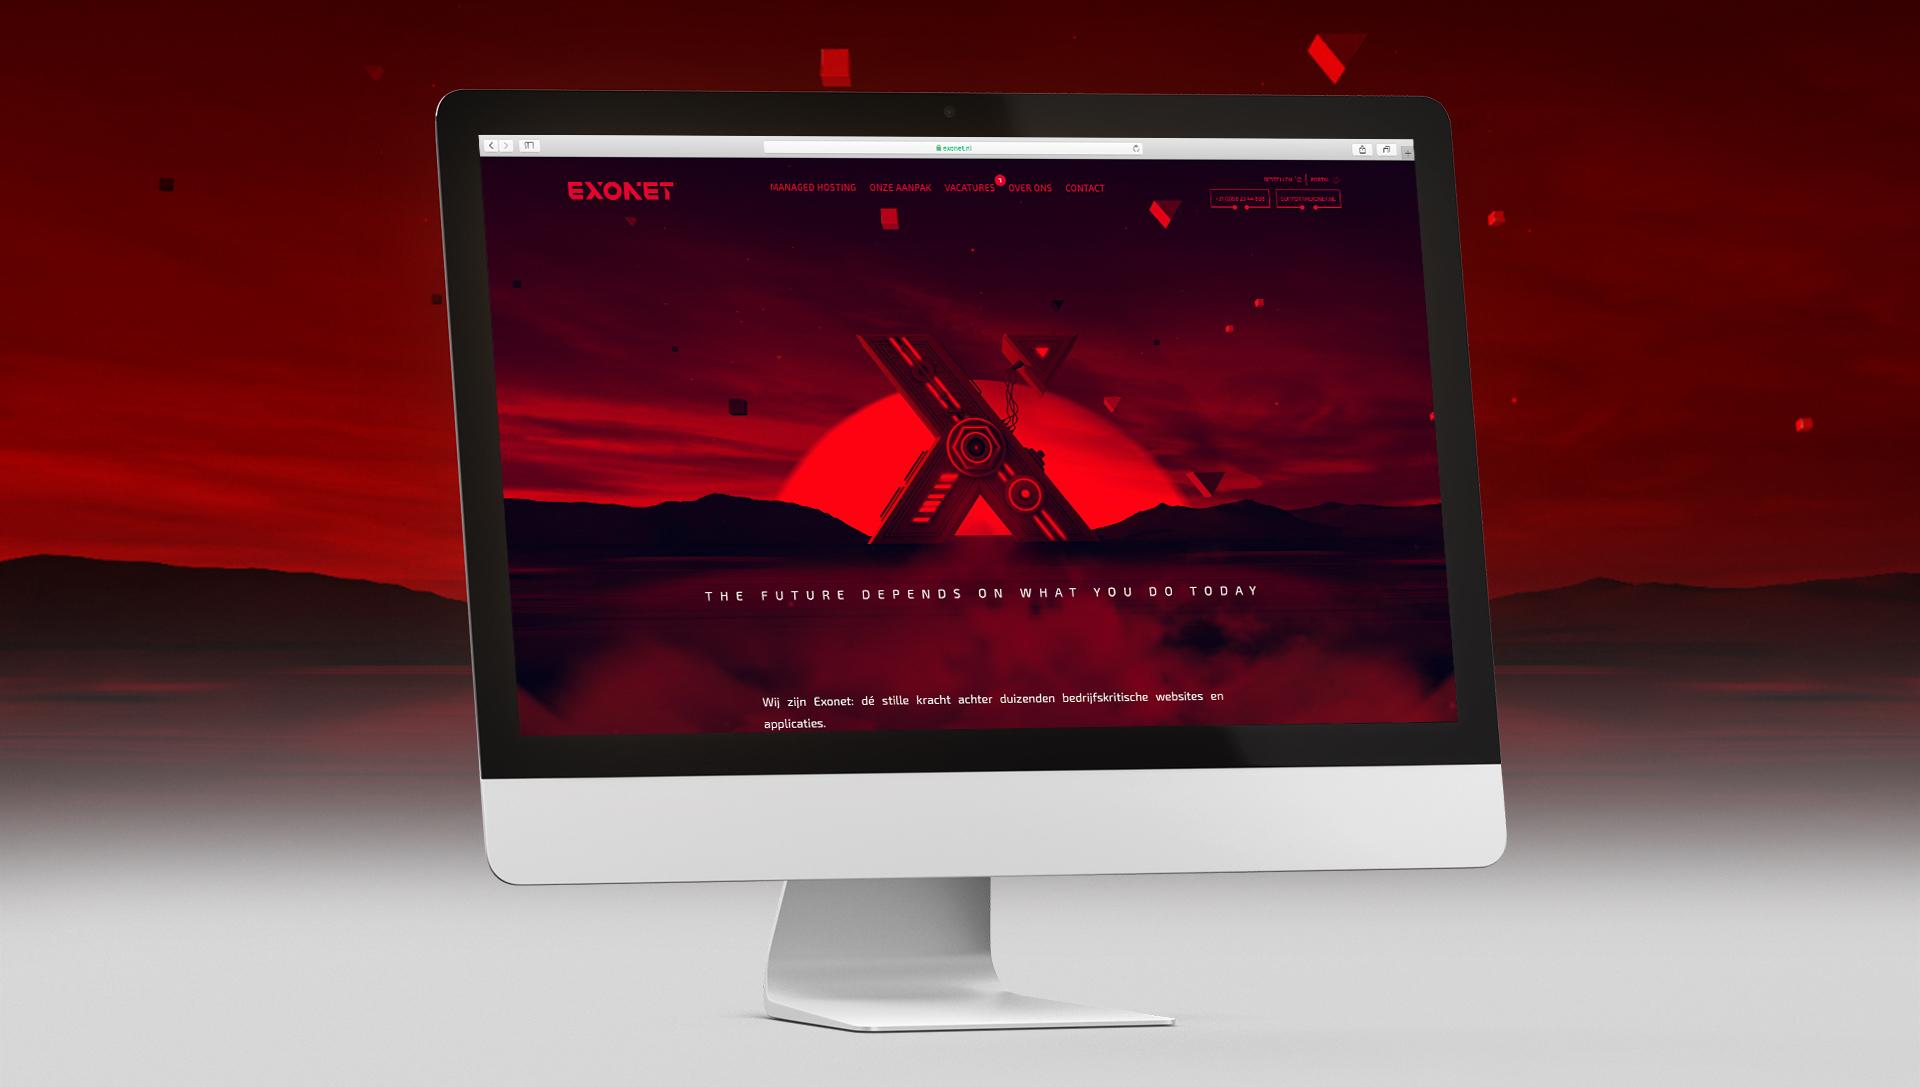 ROSH Studios Exonet Website